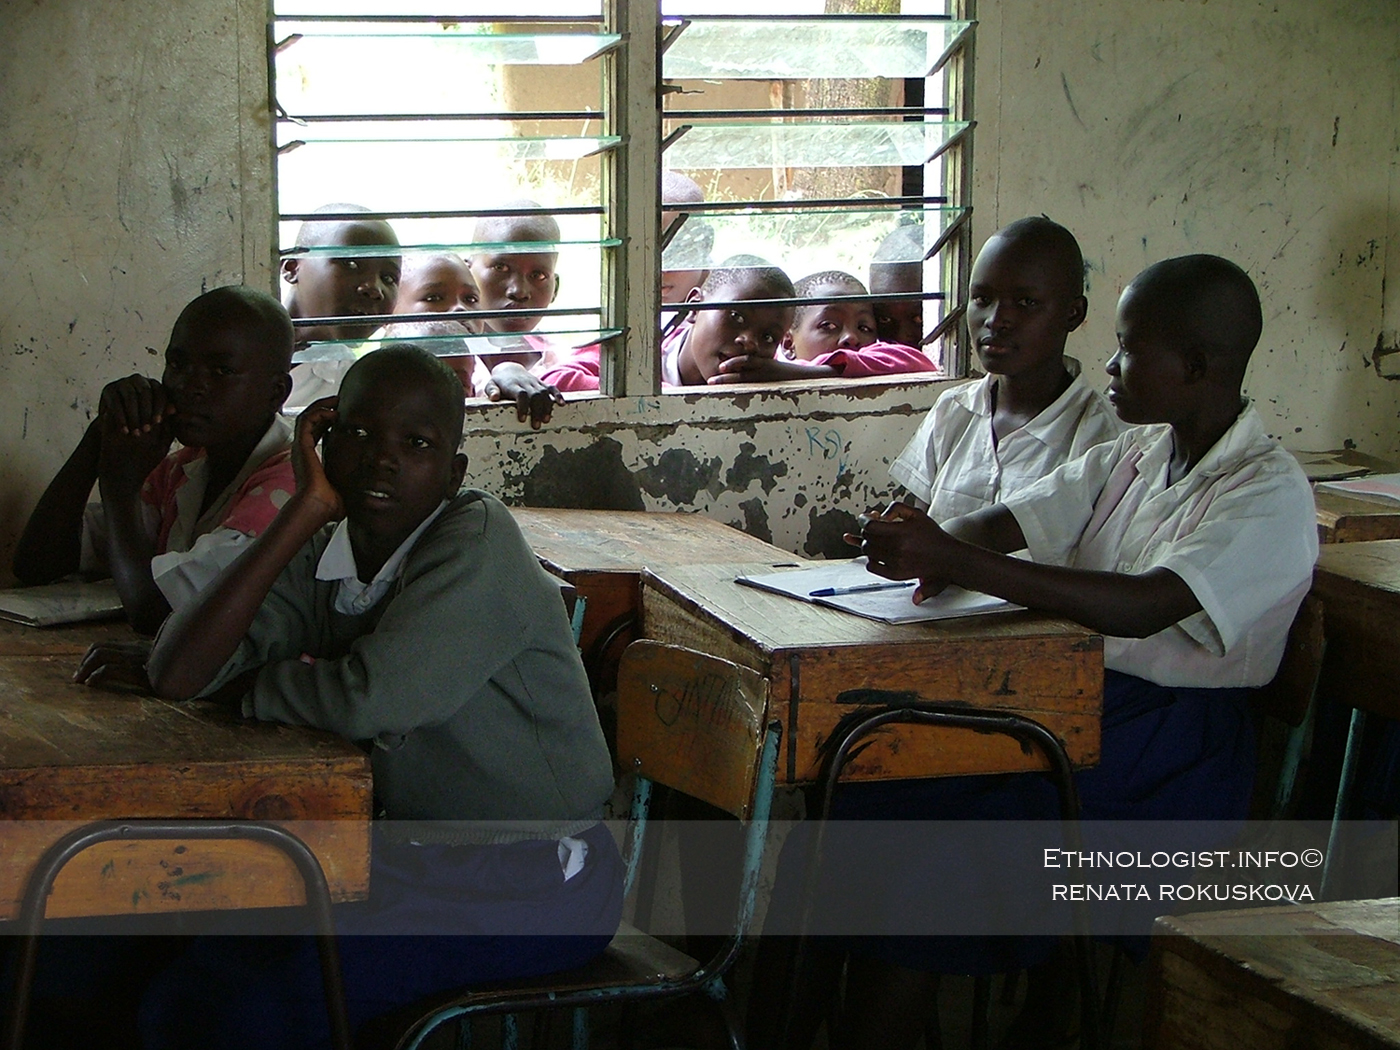 The offering of school programs in Kenyan school. Photo: Renata Rokuskova